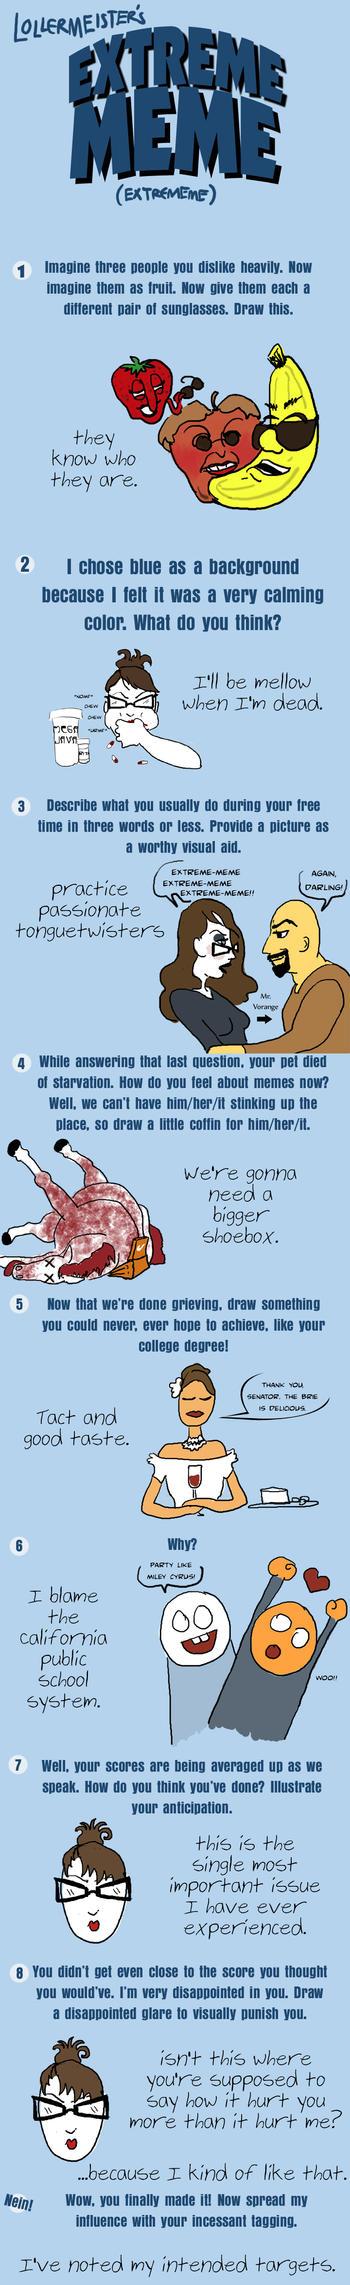 Lollermeister's Extreme Meme by LiviaVorange